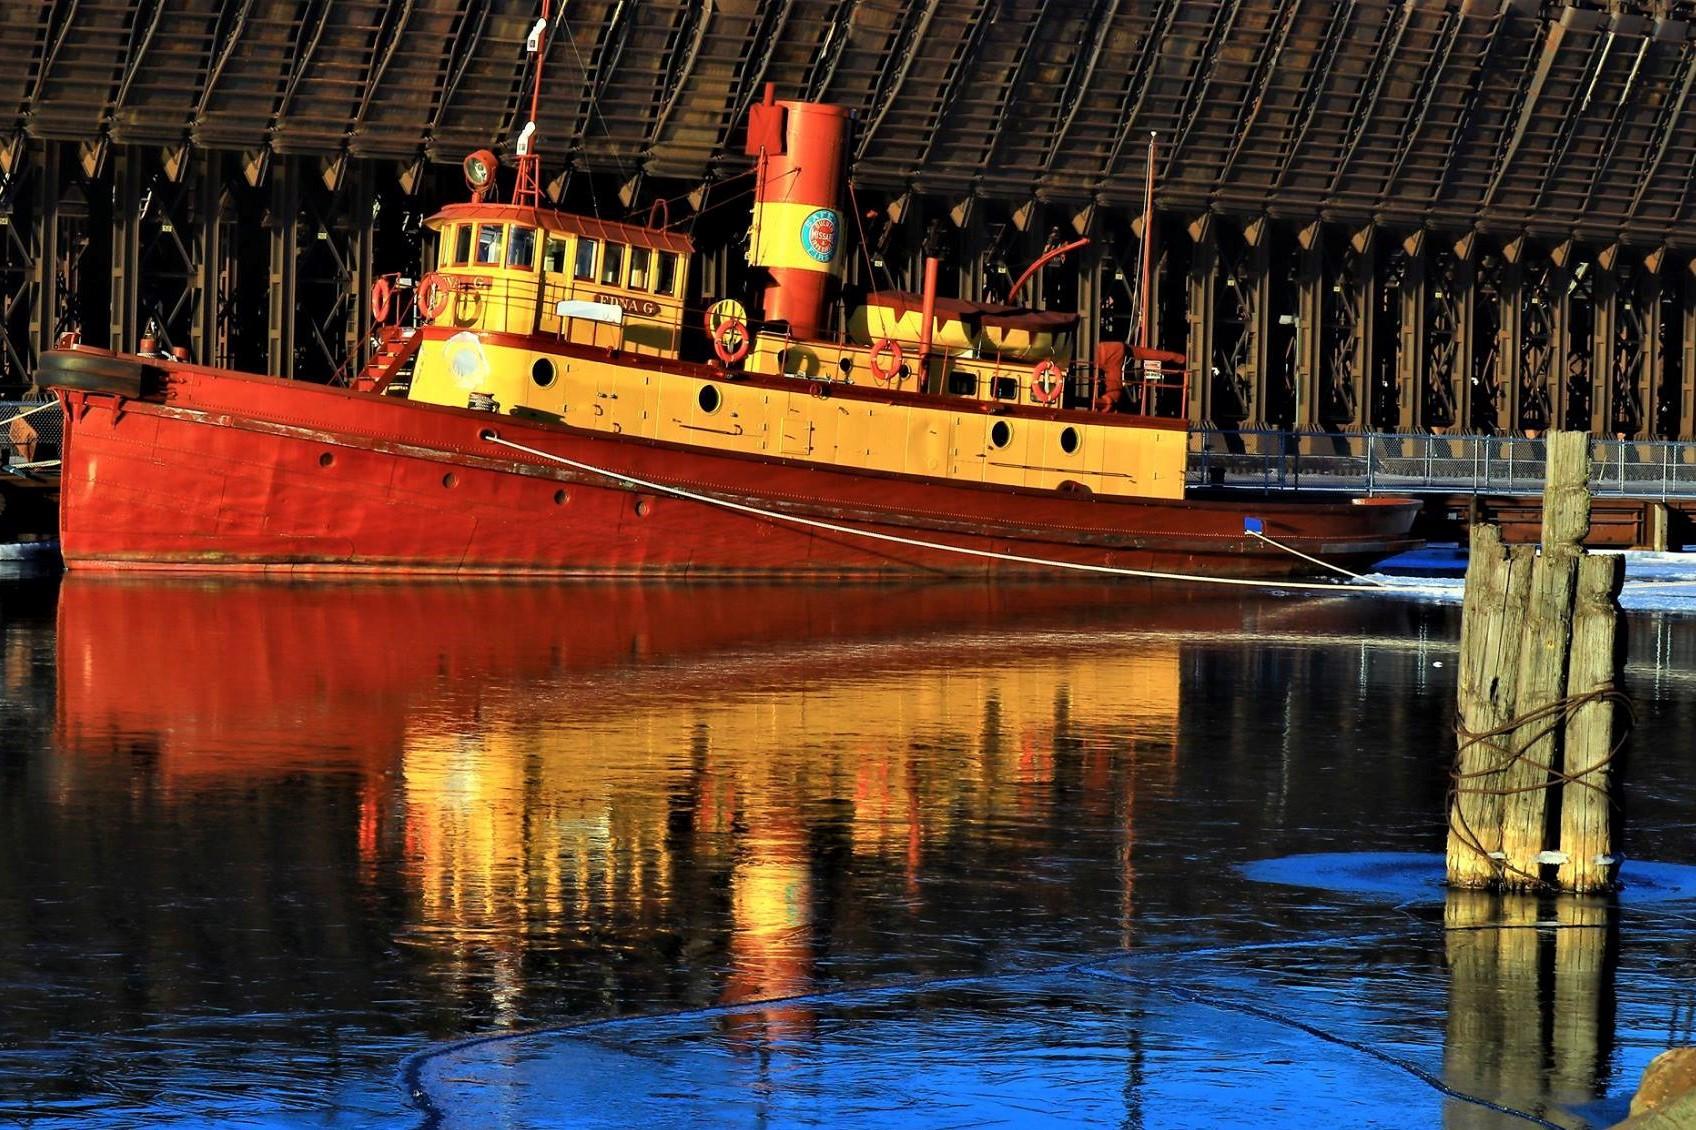 Enda G along Two Harbors Ore Docks